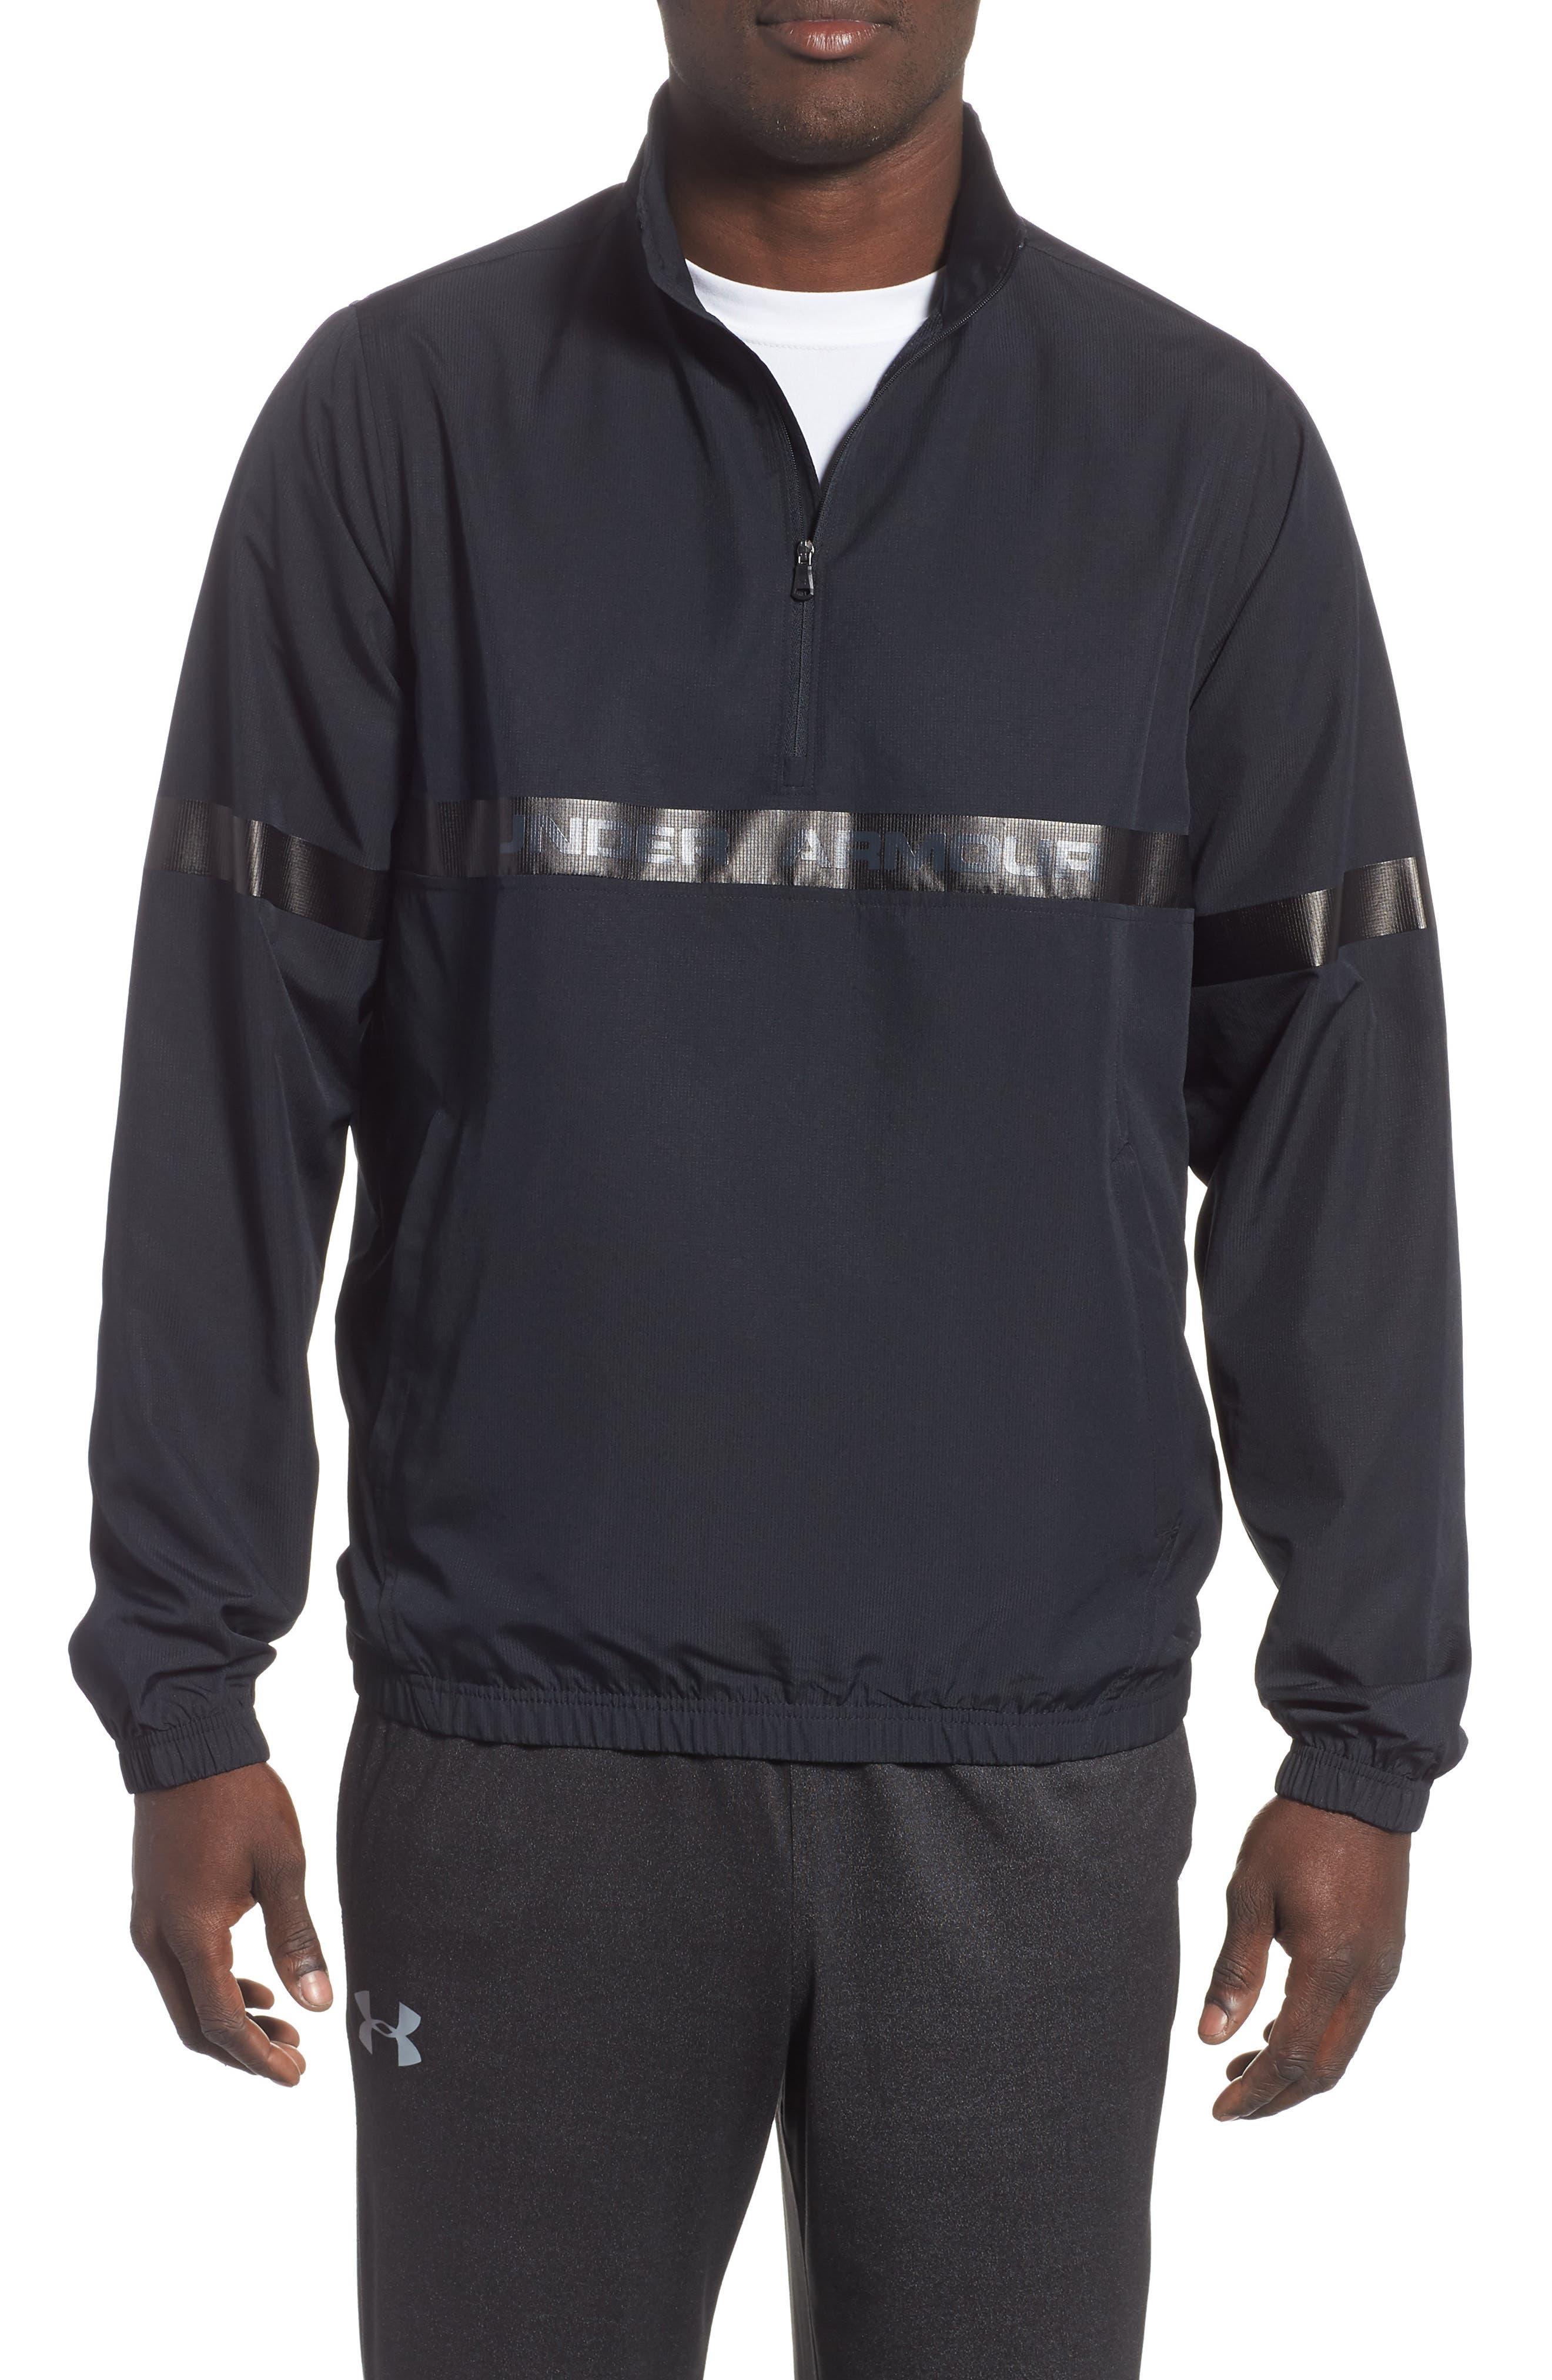 Under Armour Sportstyle Half Zip Pullover, Black